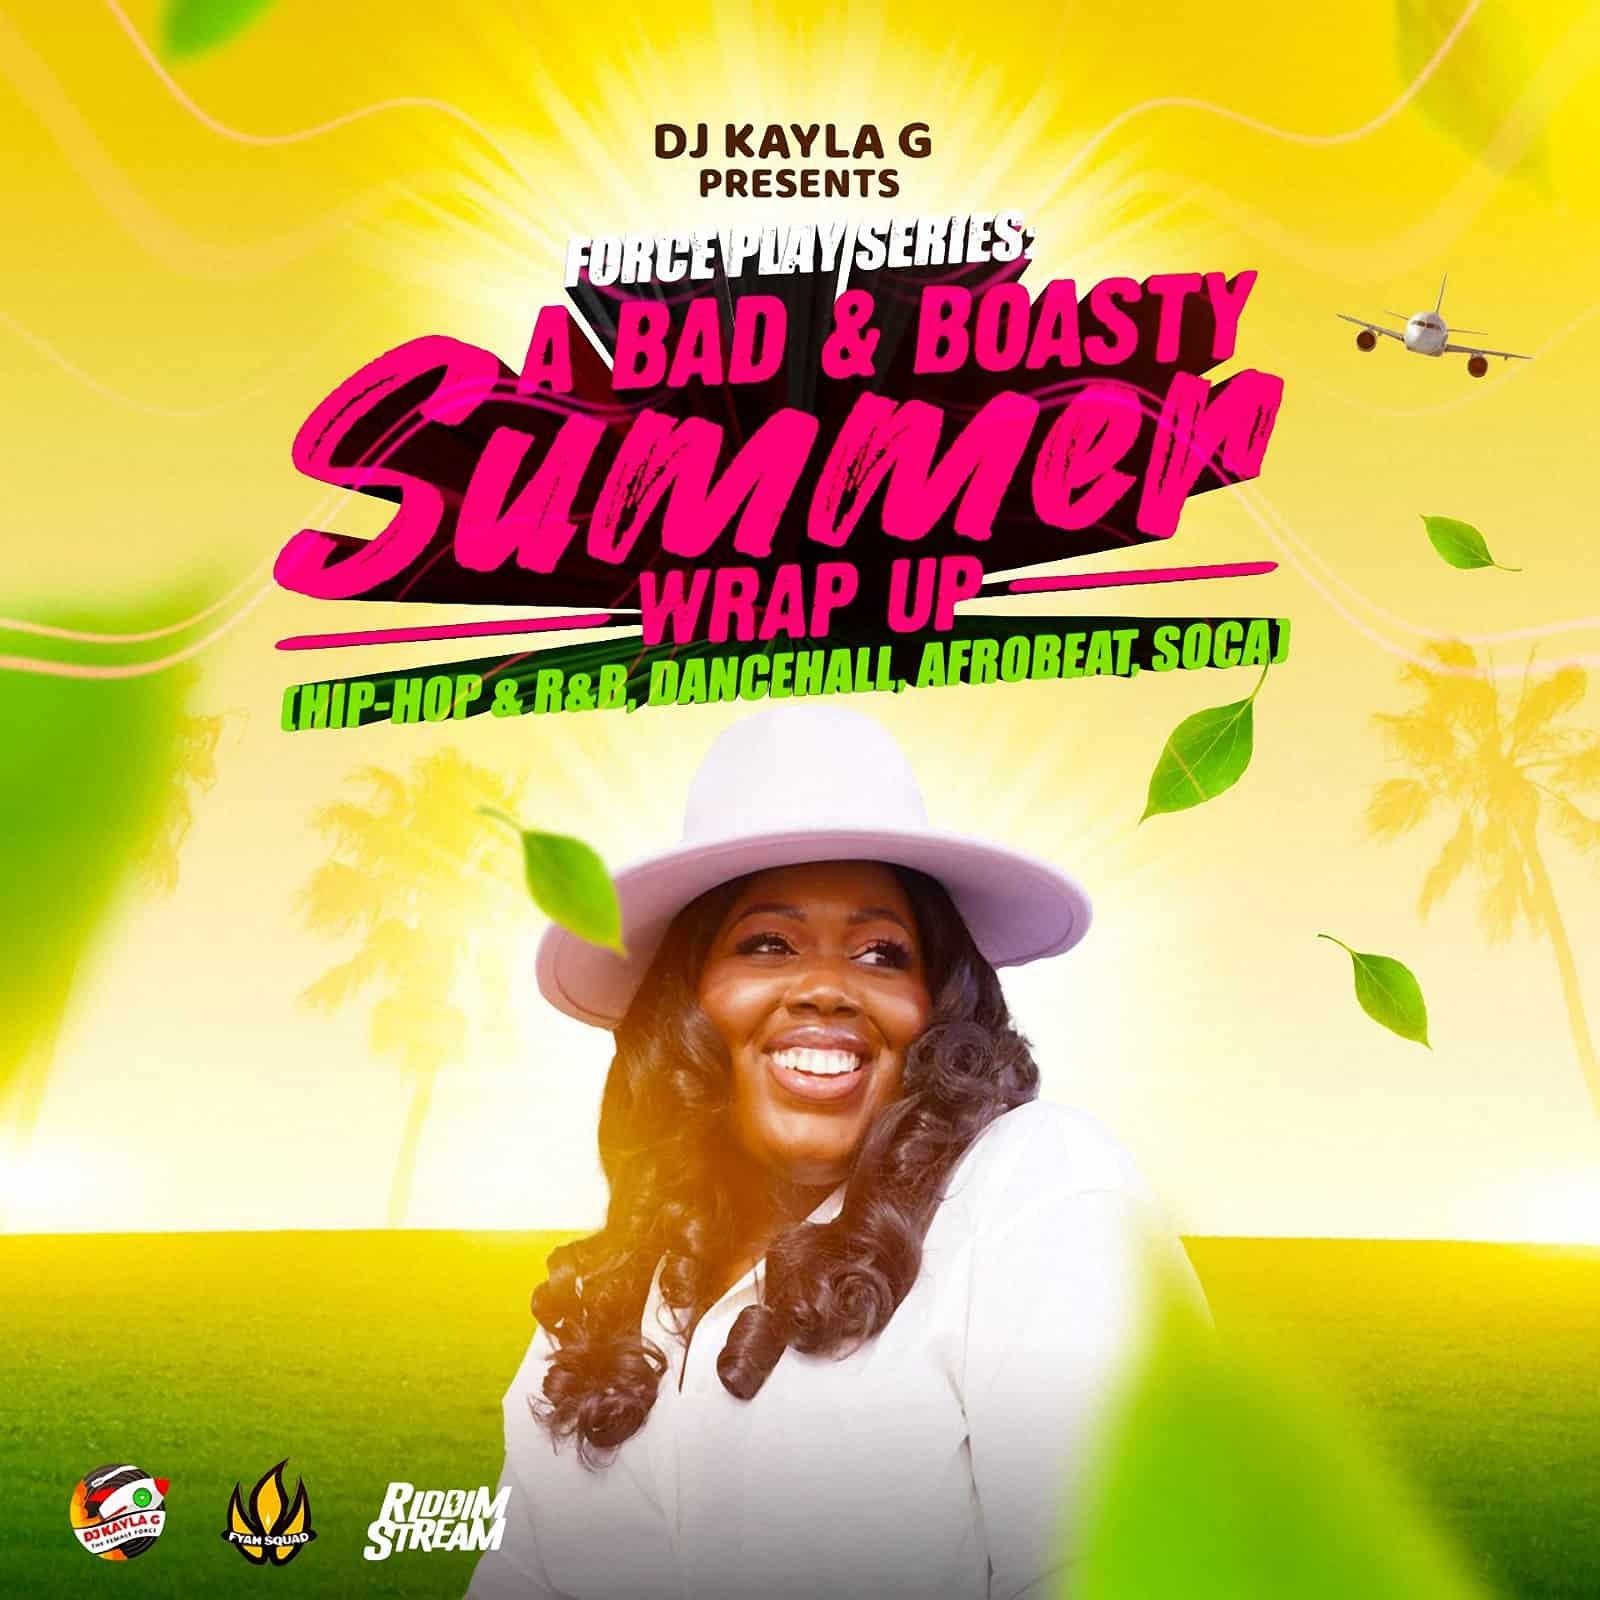 DJ Kayla G - A Bad & Boasty Summer Wrap Up (2021 Mixtape)